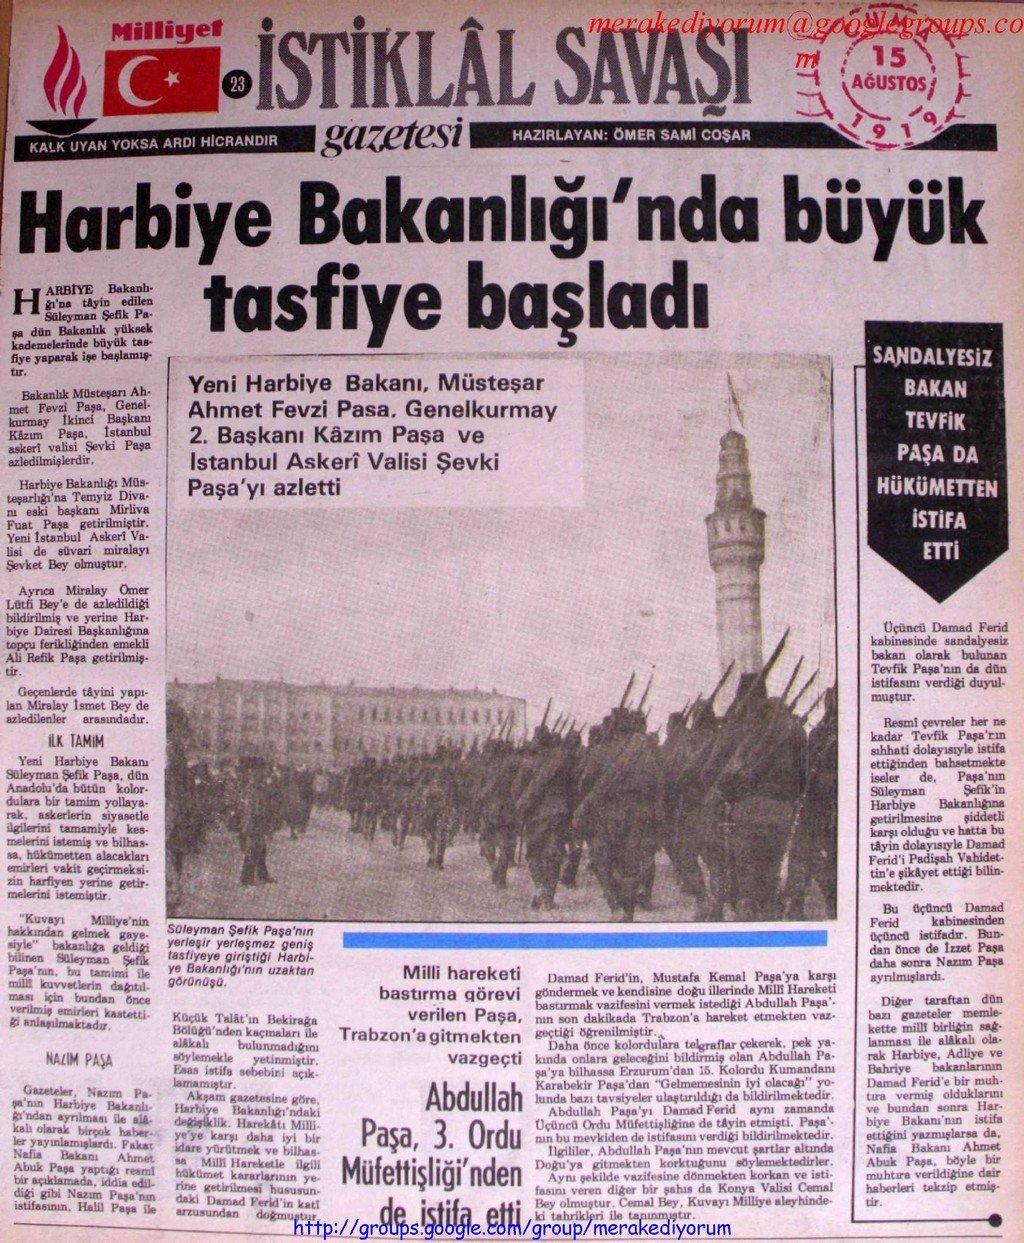 istiklal savaşı gazetesi - 15 ağustos 1919